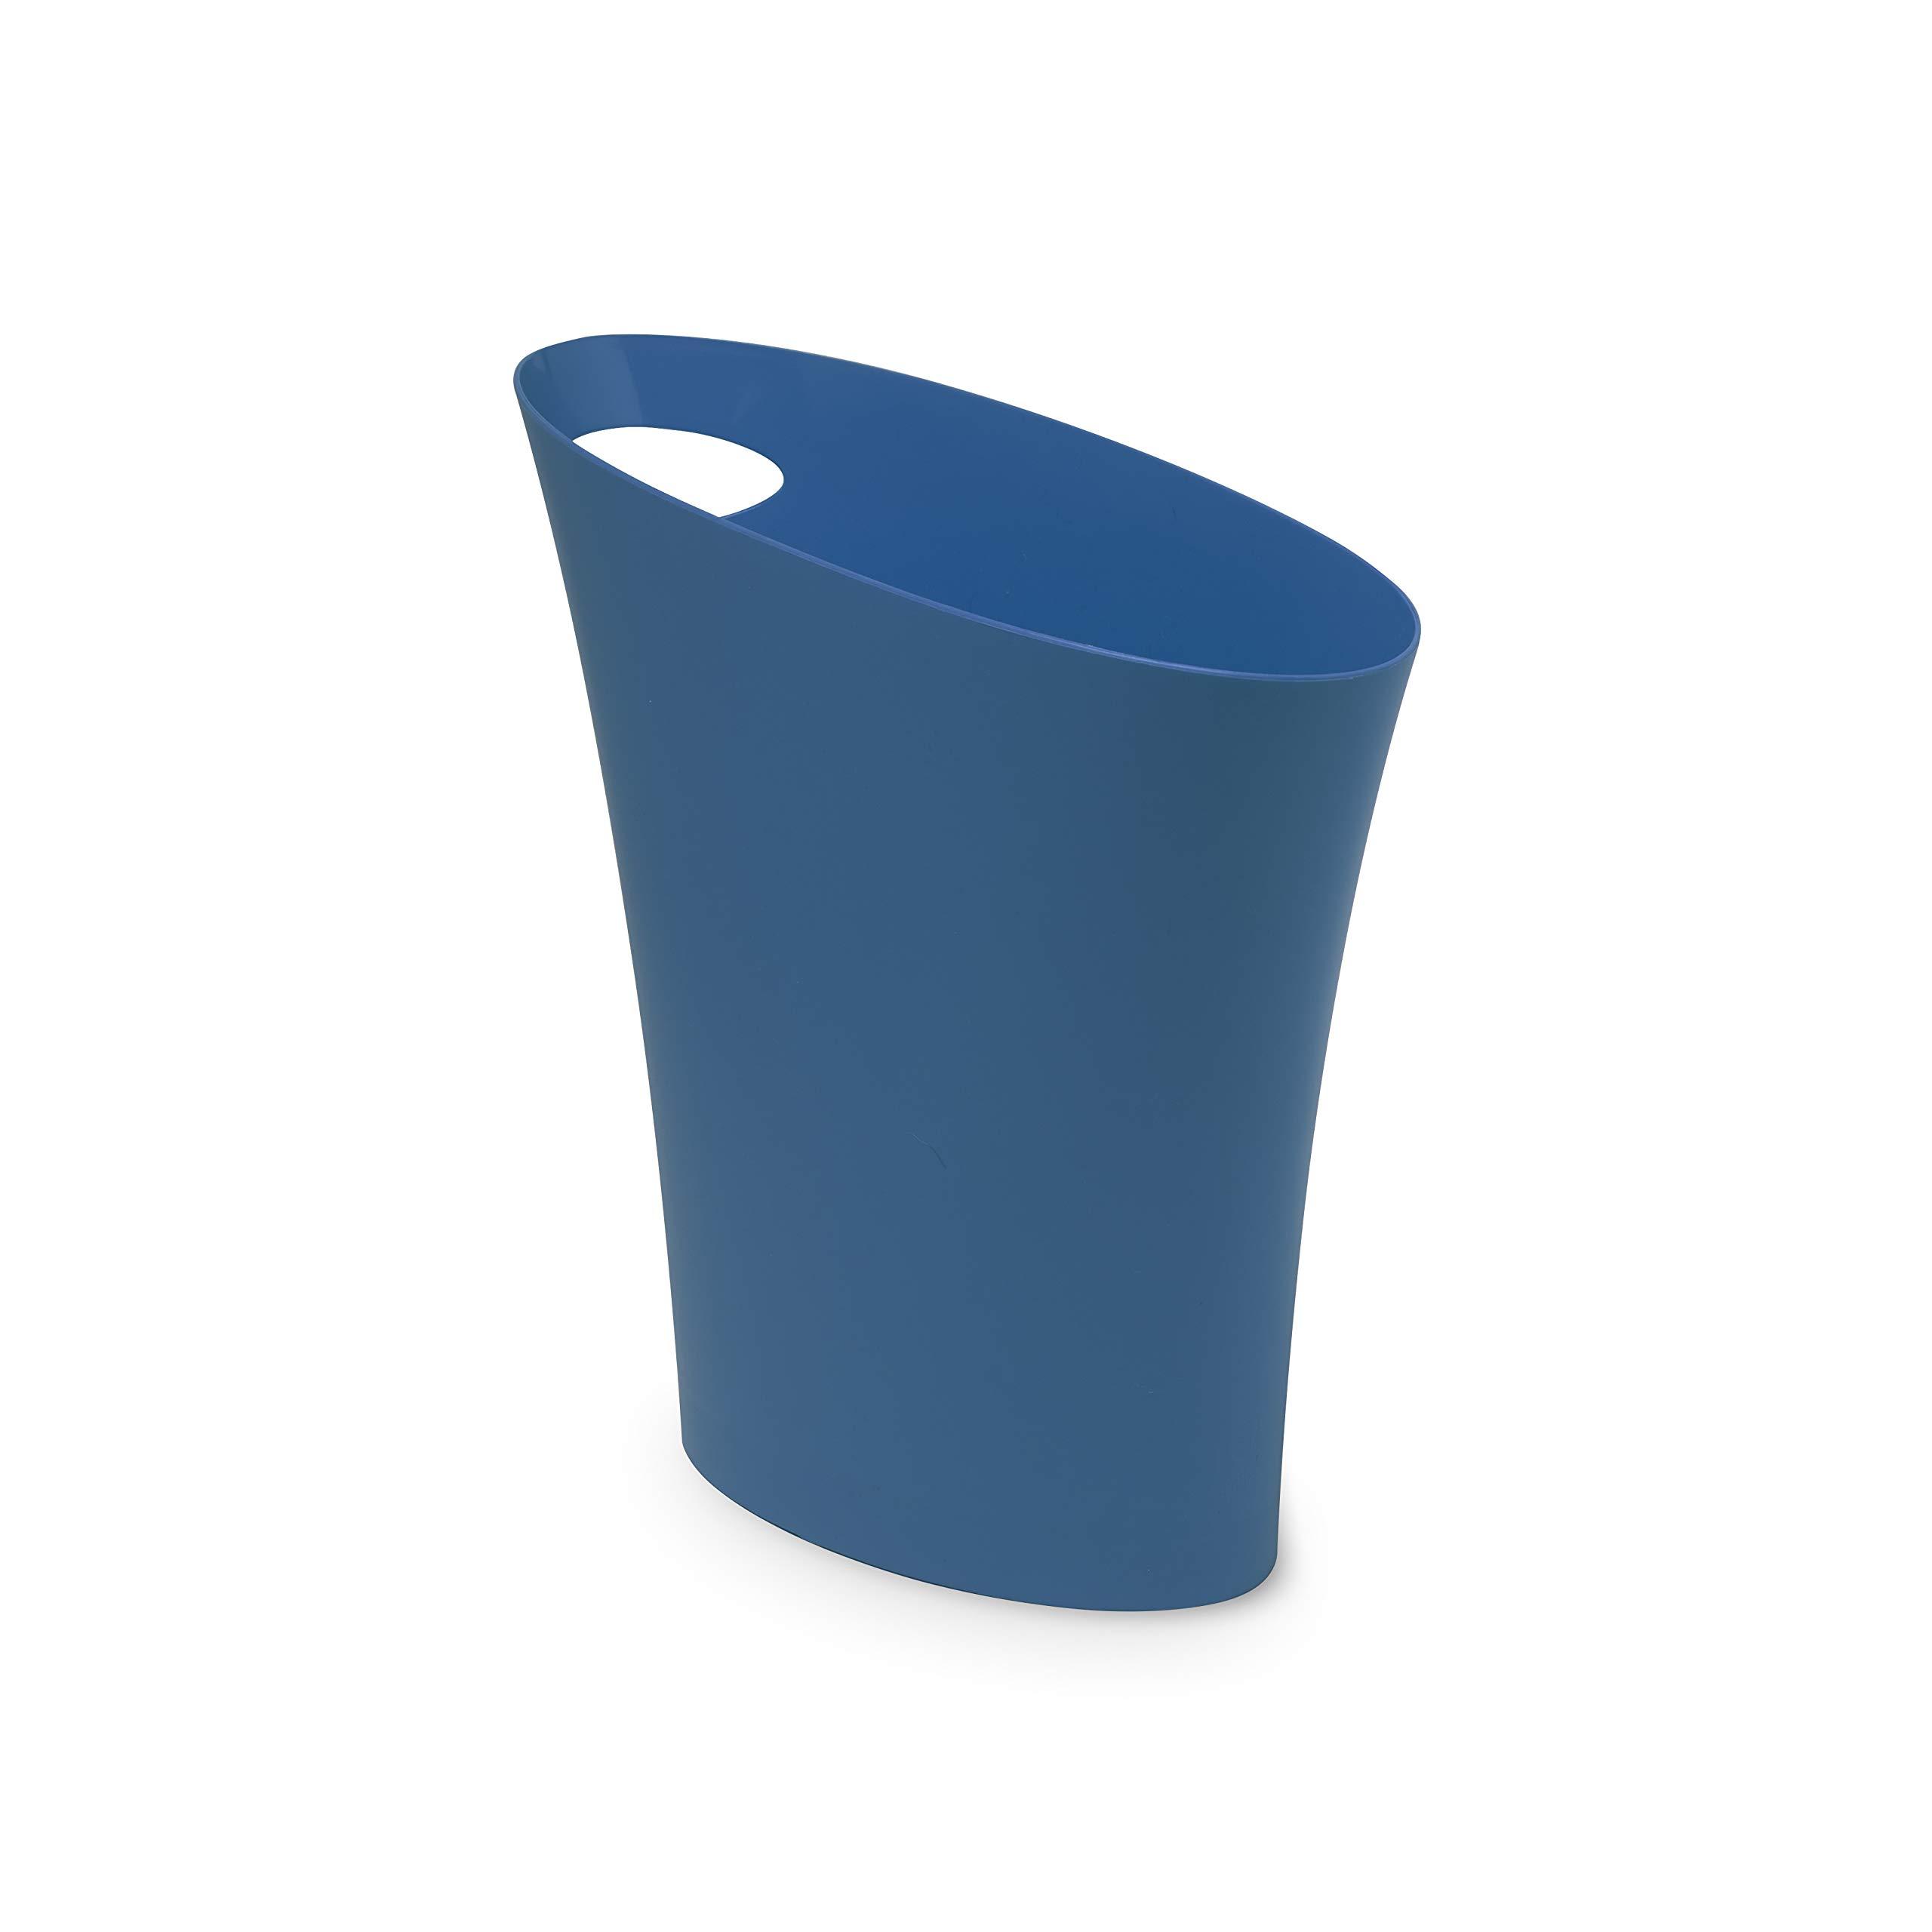 Umbra Skinny, Lagoon Blue Sleek & Stylish